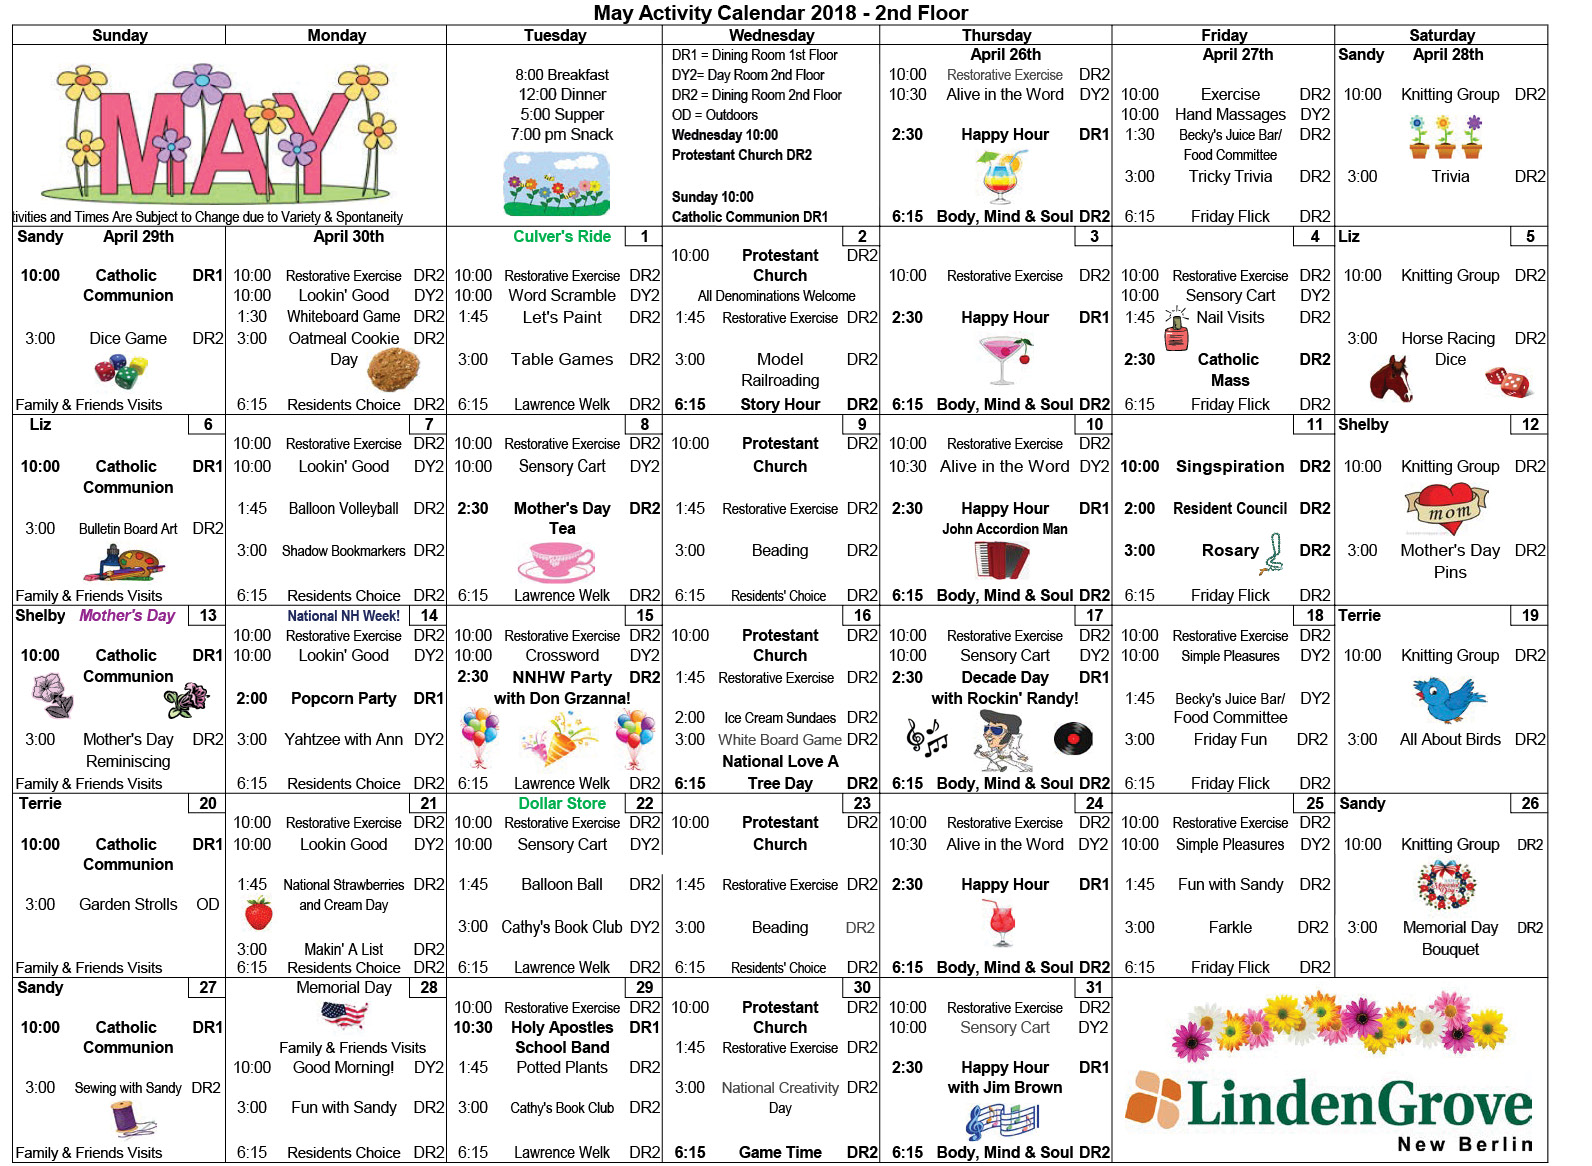 May 2018 NB SNF Floor 2 Calendar